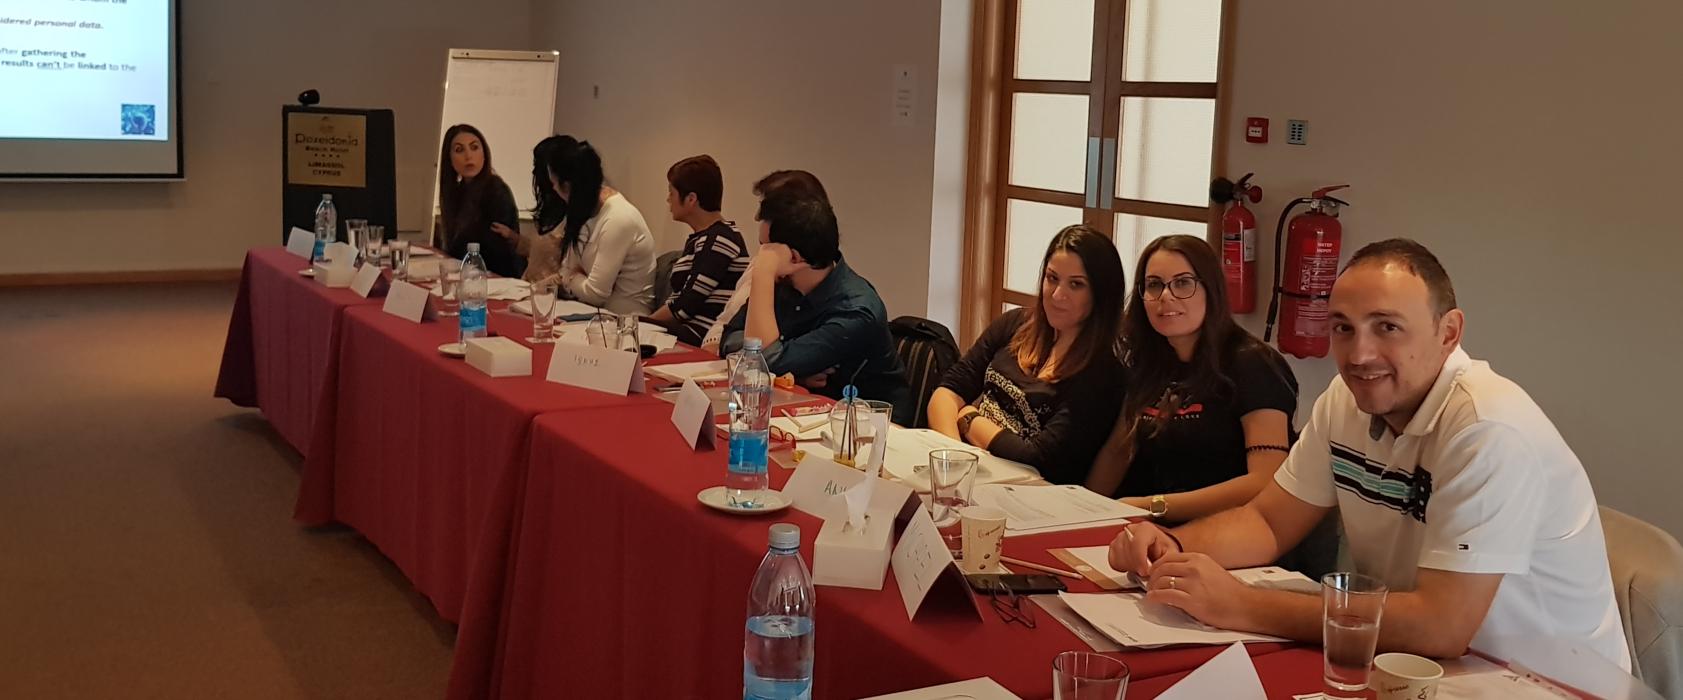 AGP Internal seminar on GDPR   Continued Professional Development